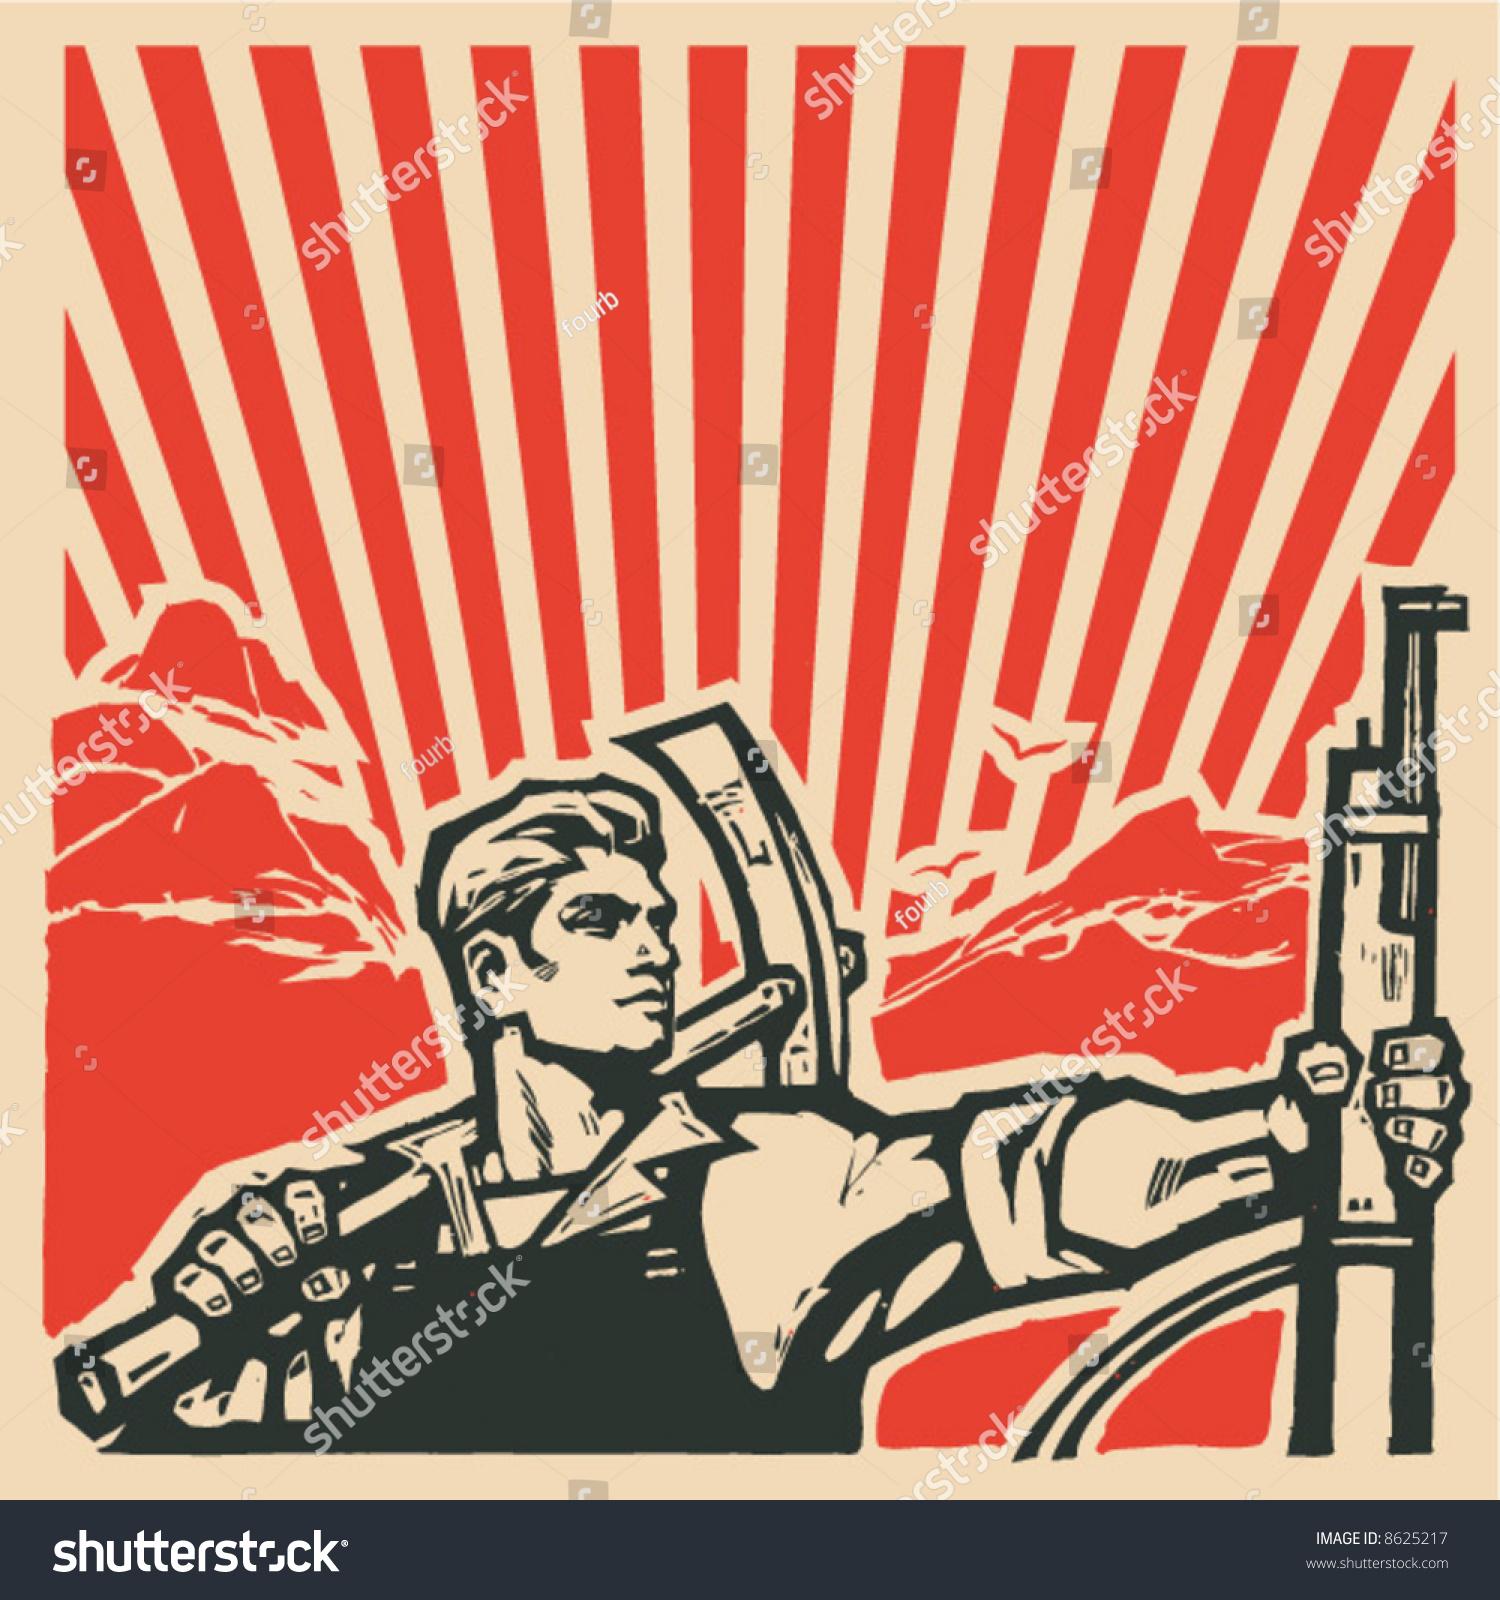 Old Communism Poster Stock Vector 8625217 - Shutterstock